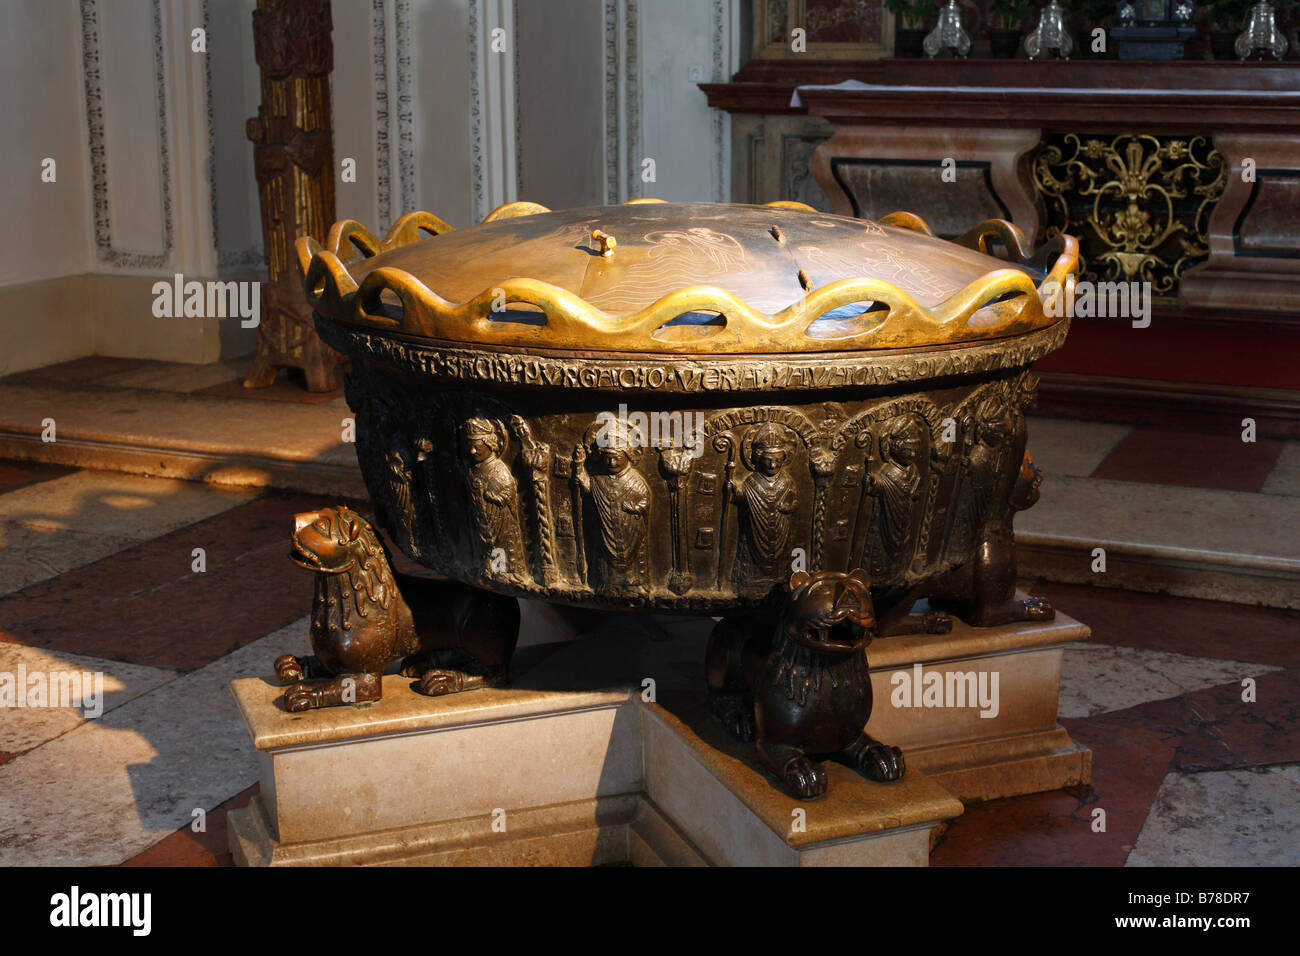 Baptismal font in St. Rupert und Virgil cathedral, Salzburg, Austria, EuropeStock Photo